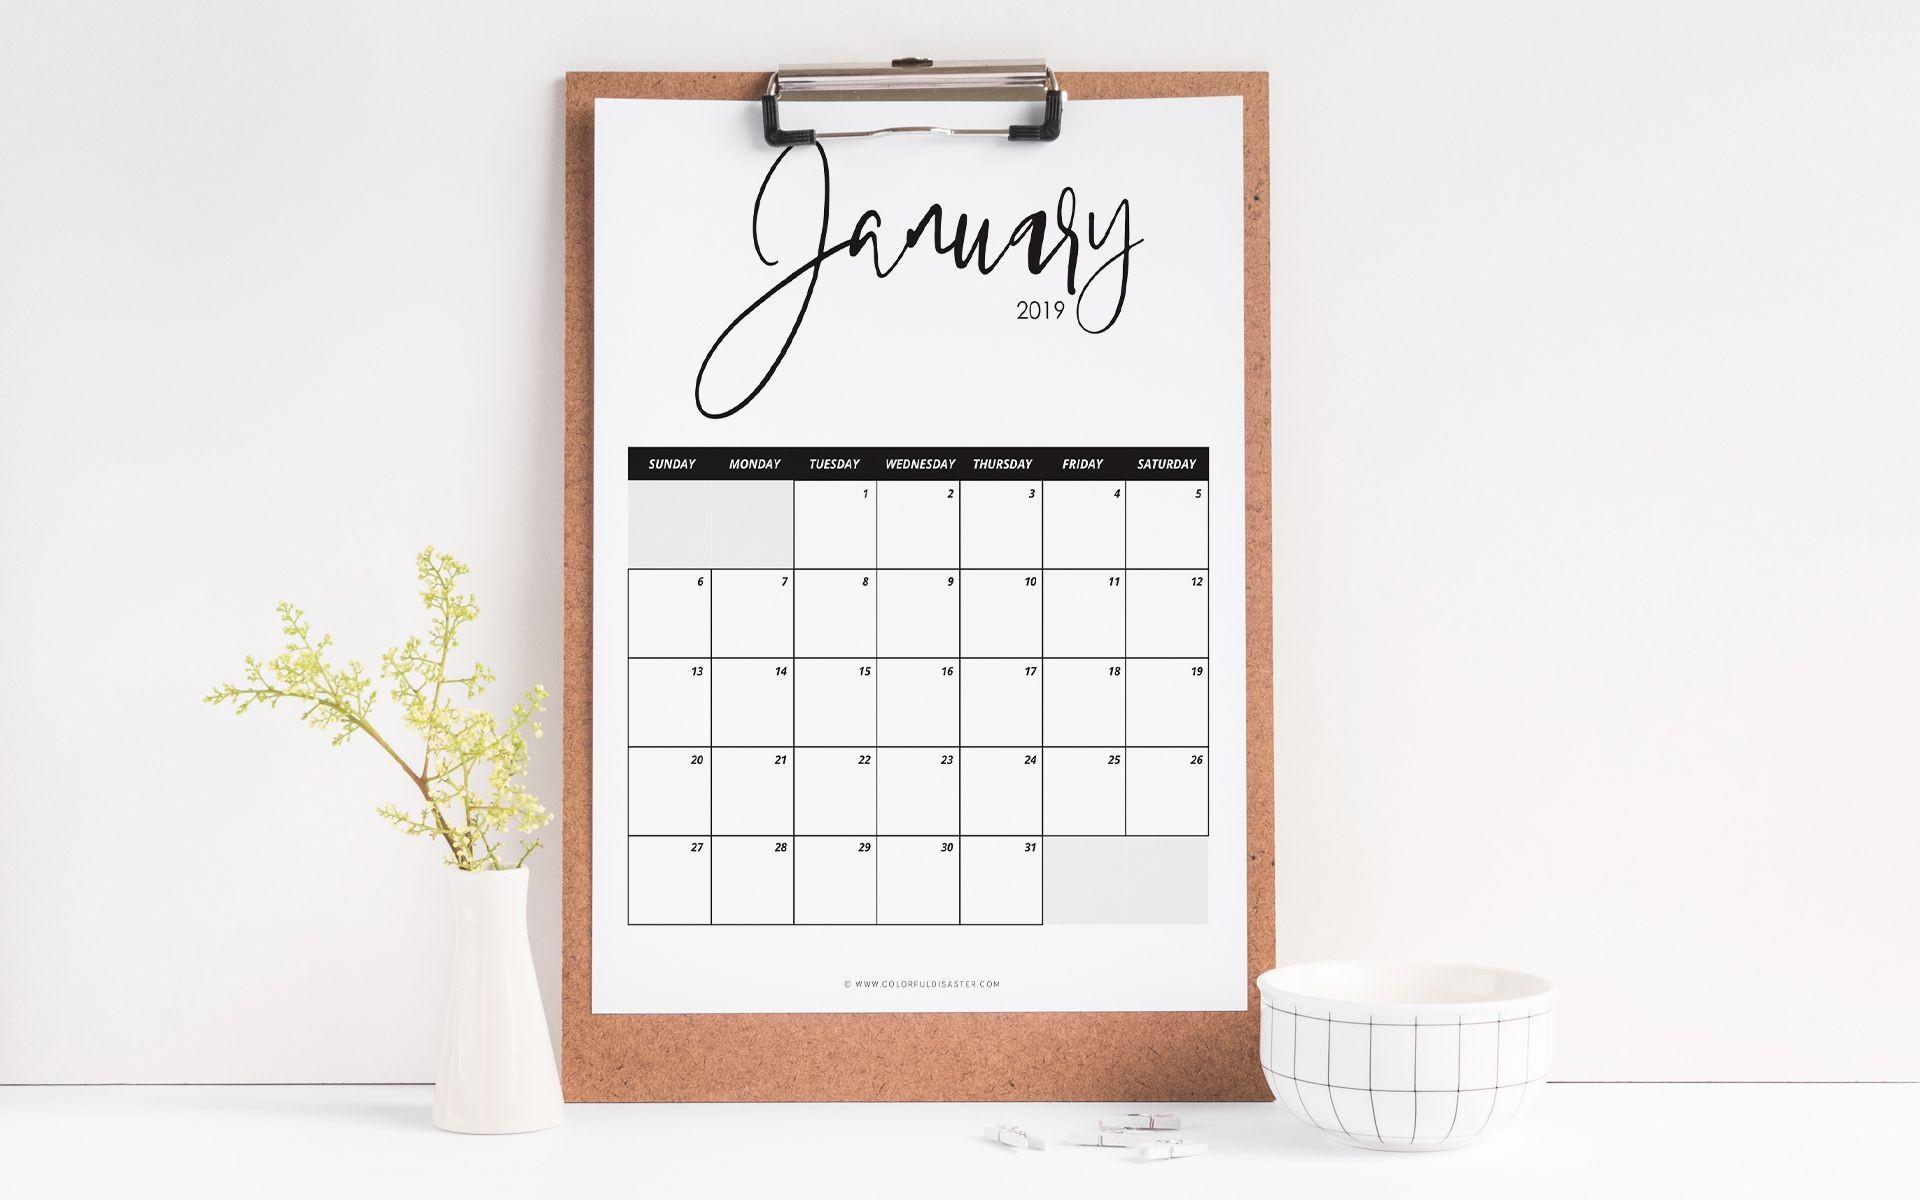 10 Stylish Free Printable Calendars for 2019